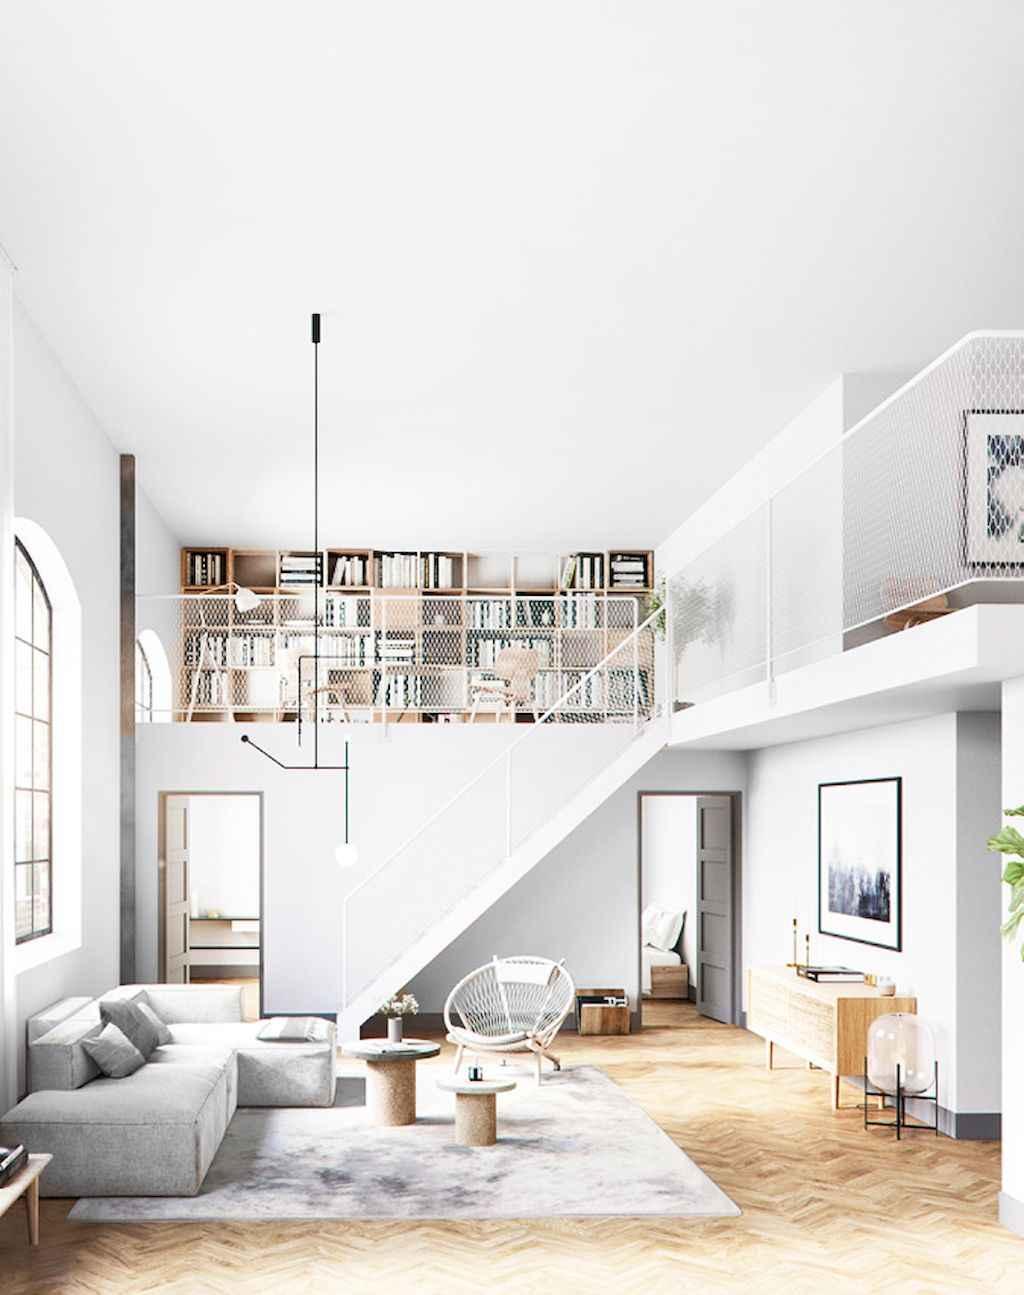 Cool creative loft apartment decorating ideas (35)